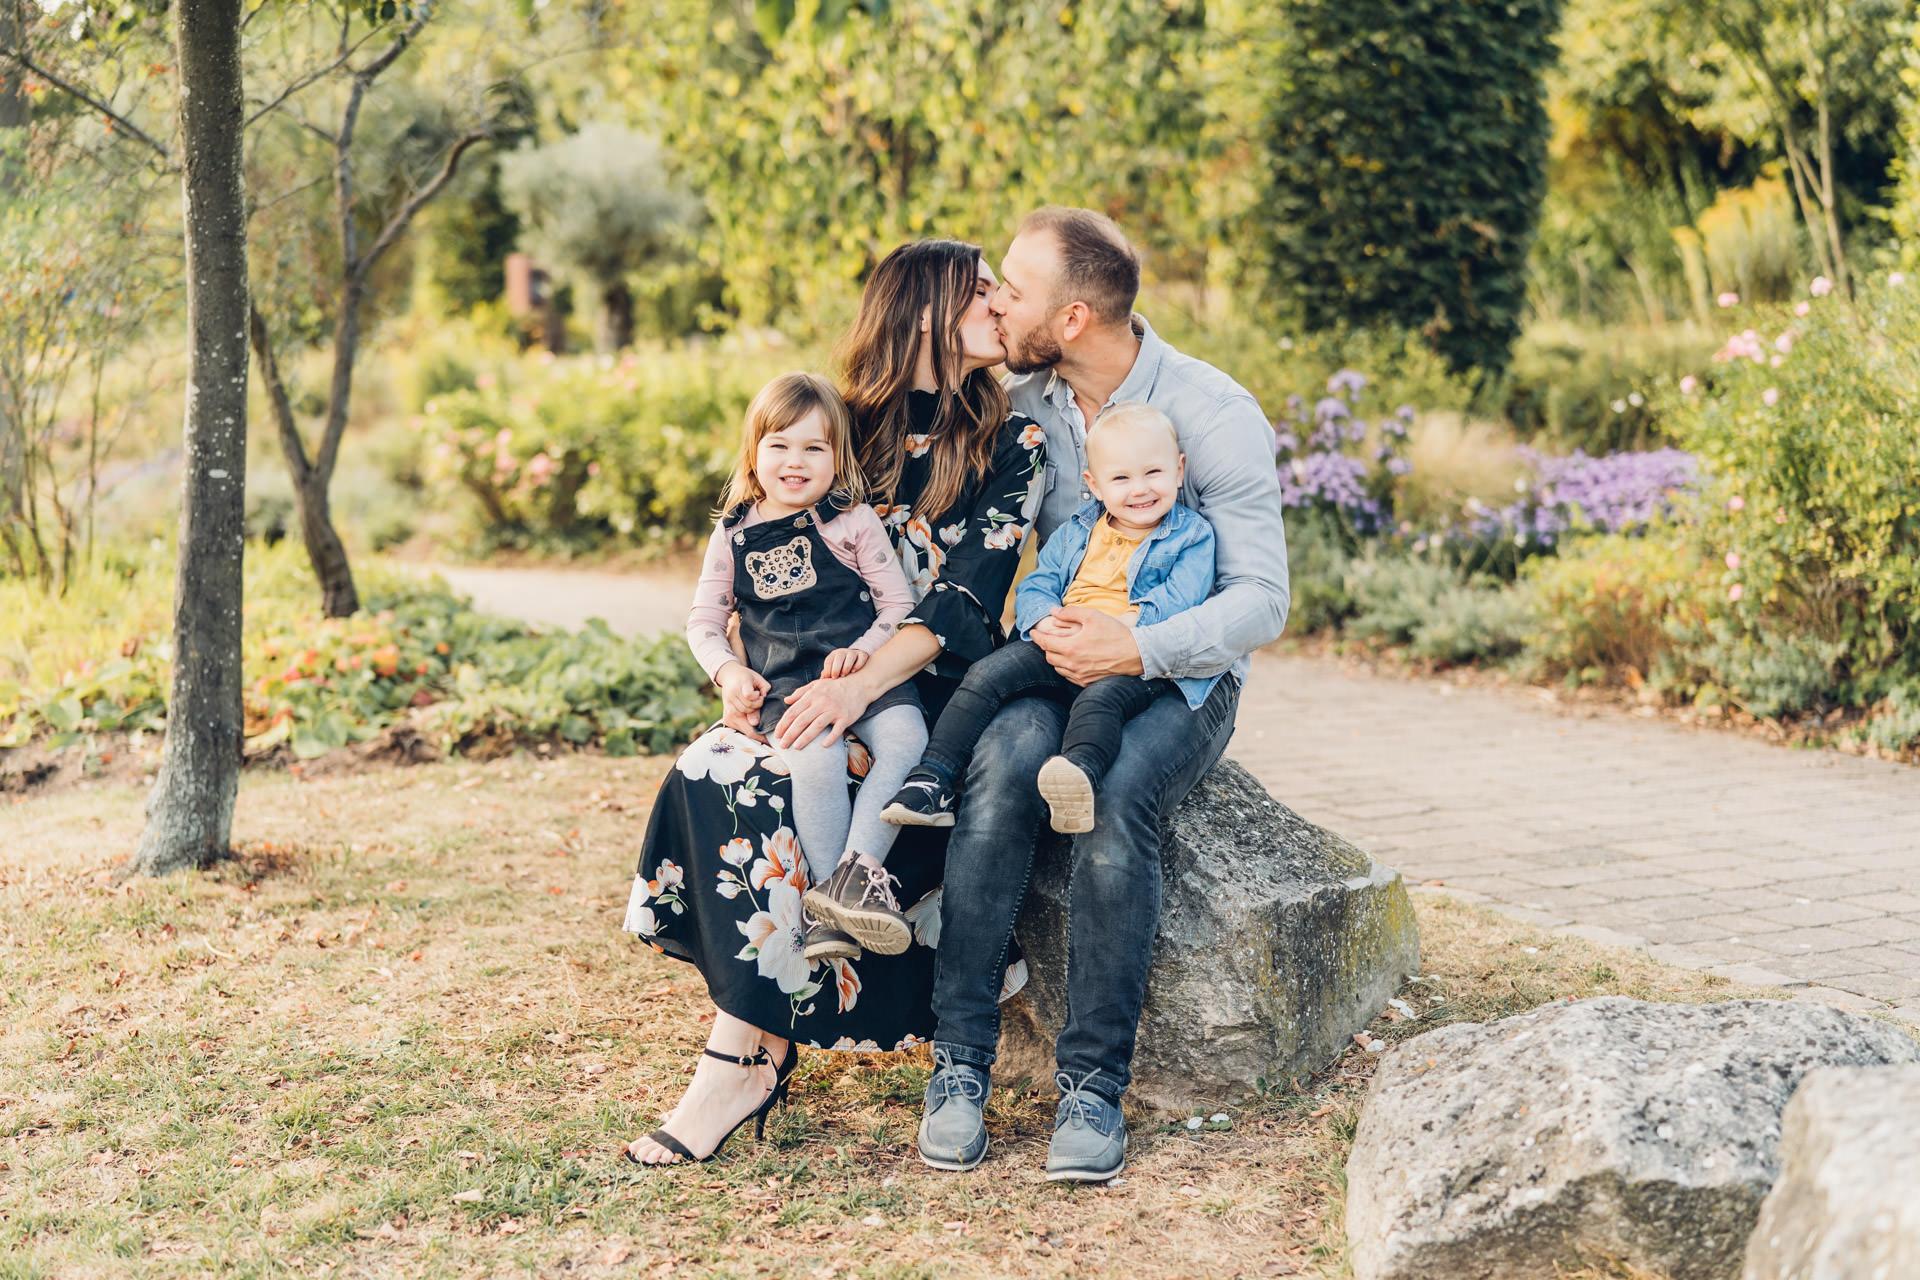 Familienfotos Fotograf Mainz